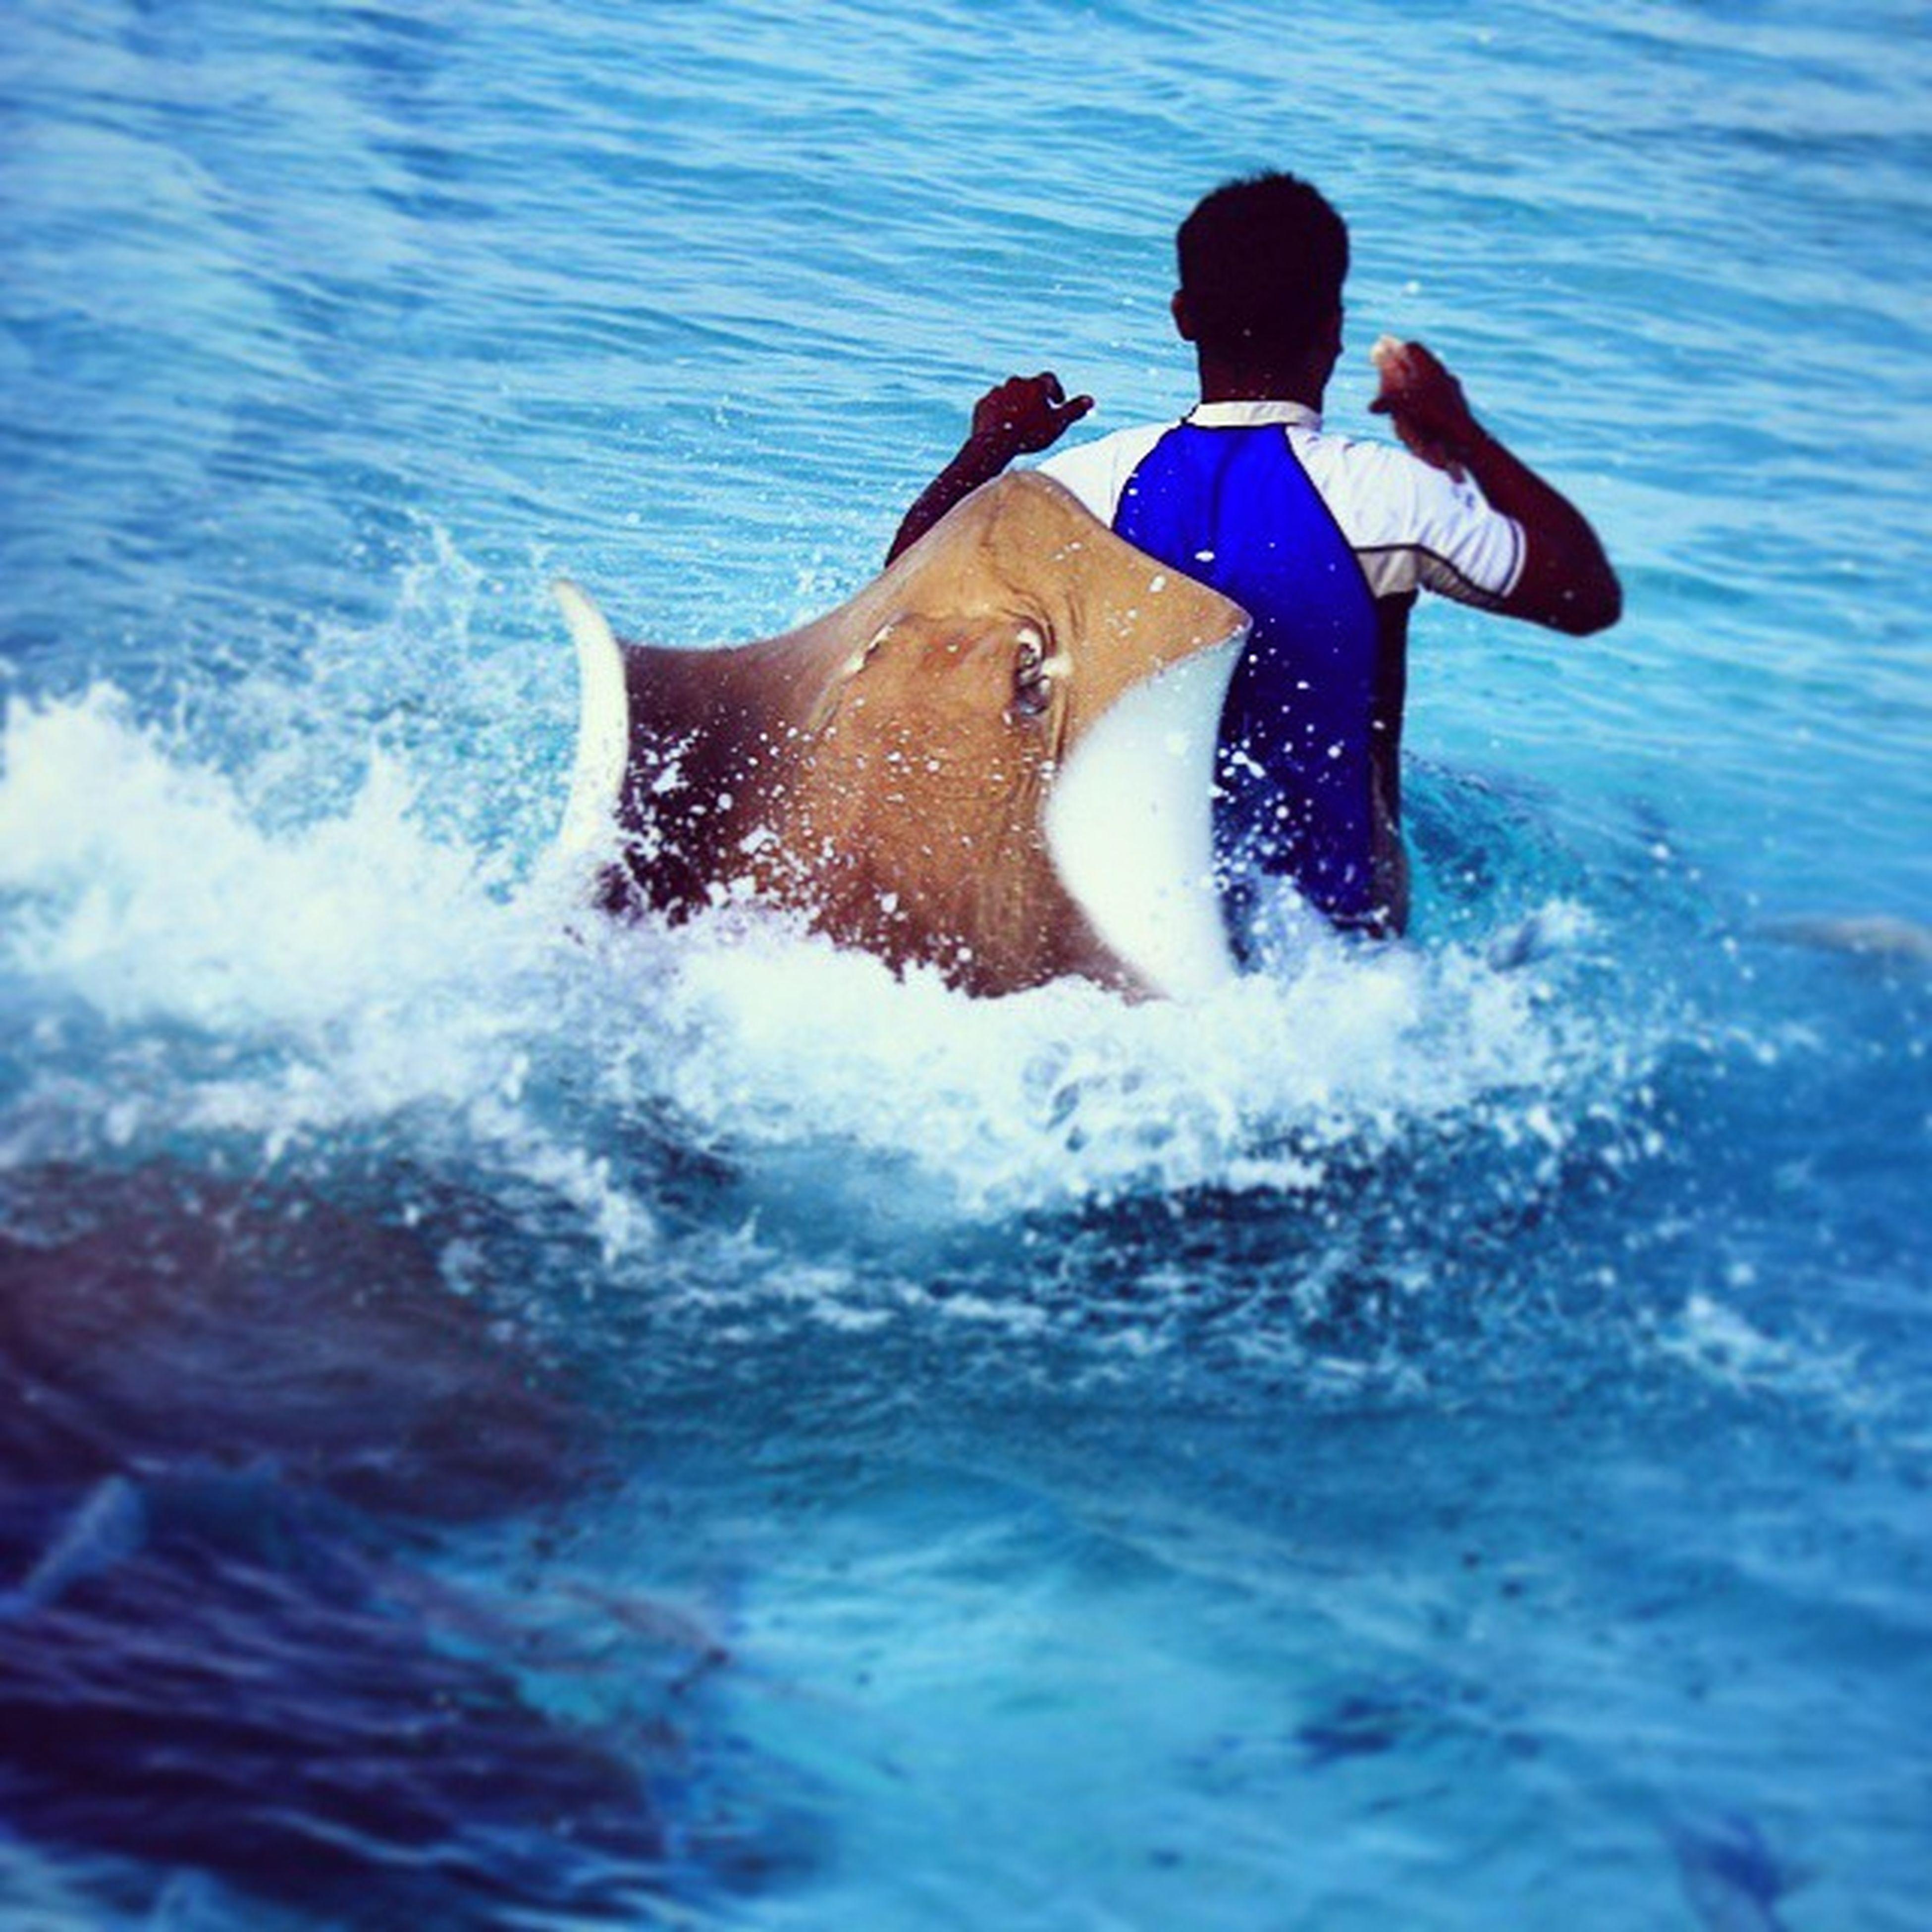 water, sea, animal themes, one animal, leisure activity, lifestyles, pets, swimming, waterfront, dog, domestic animals, mammal, motion, splashing, wave, full length, enjoyment, vacations